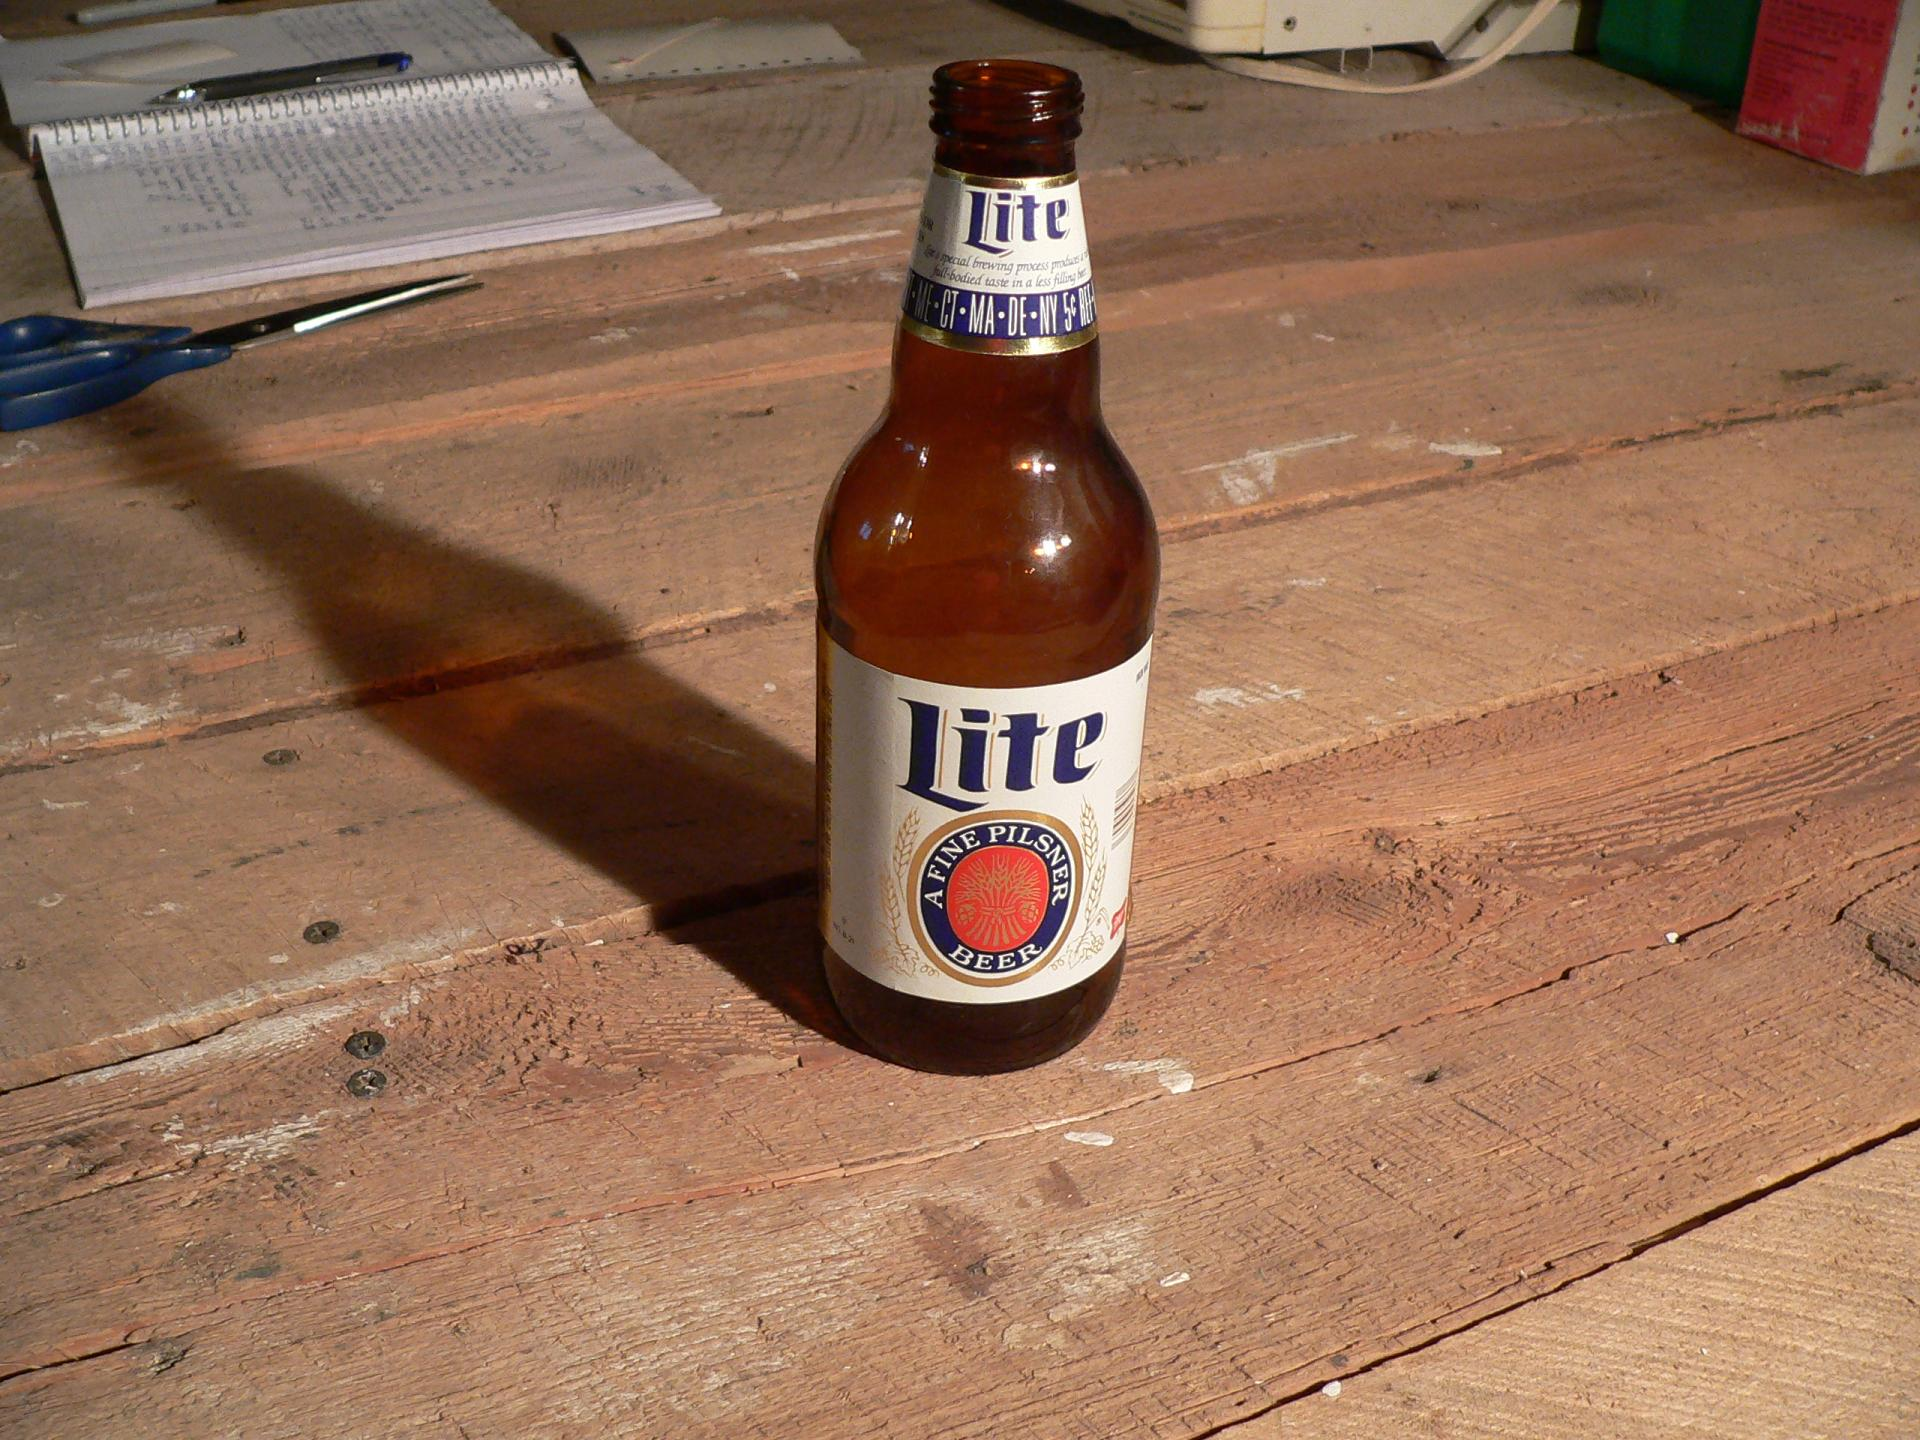 Bière lite # 4739.5